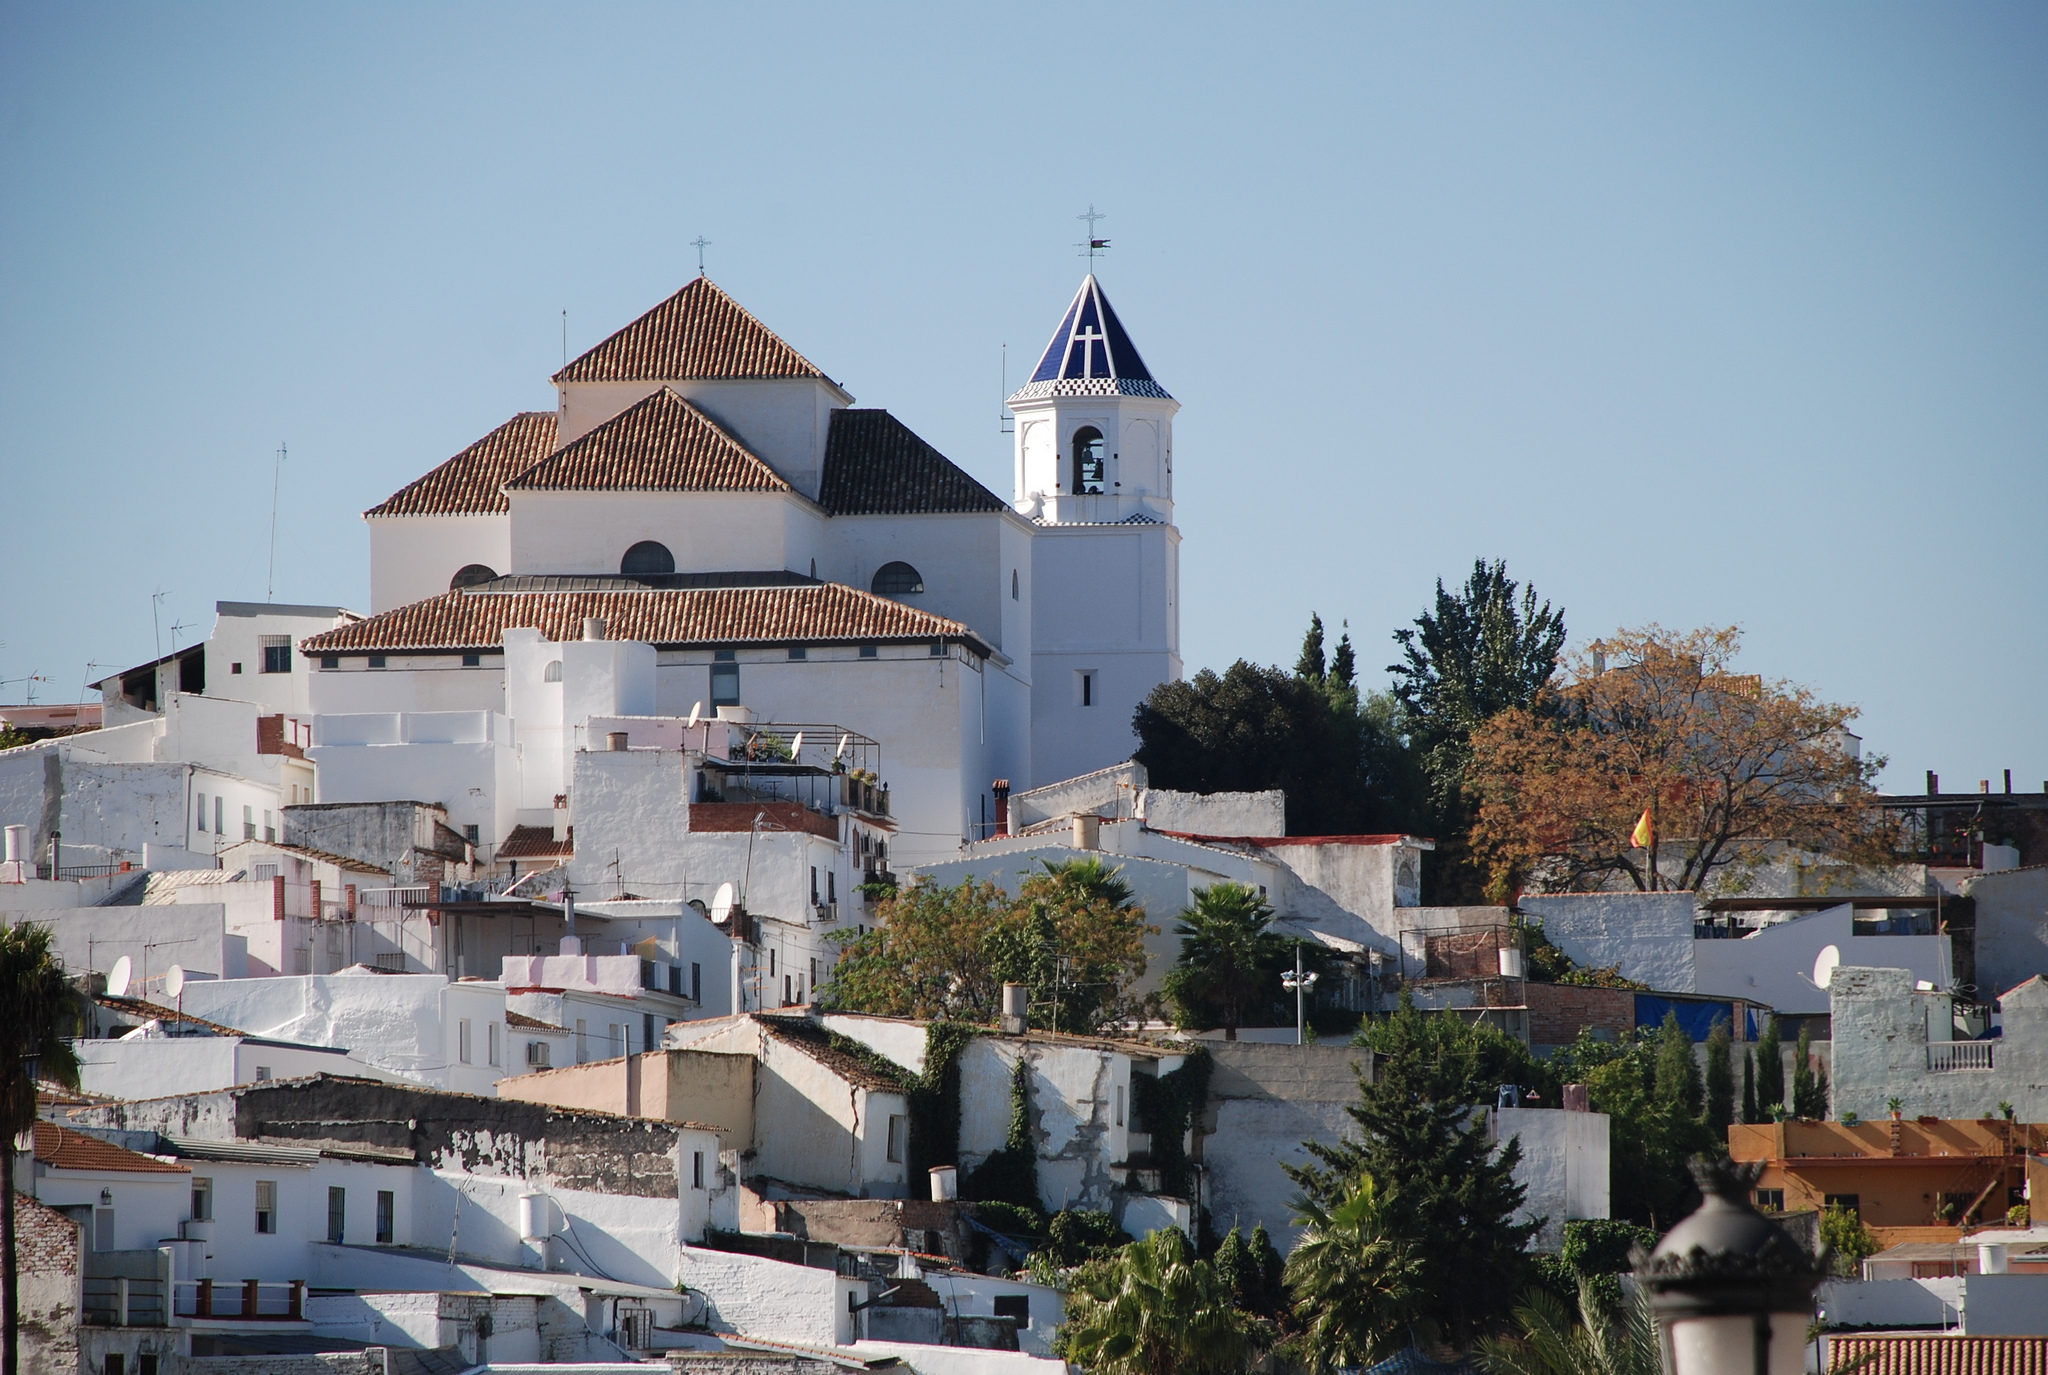 Alhaurín el Grande view - Alhaurin el Grande, a picturesque village to find your ideal property